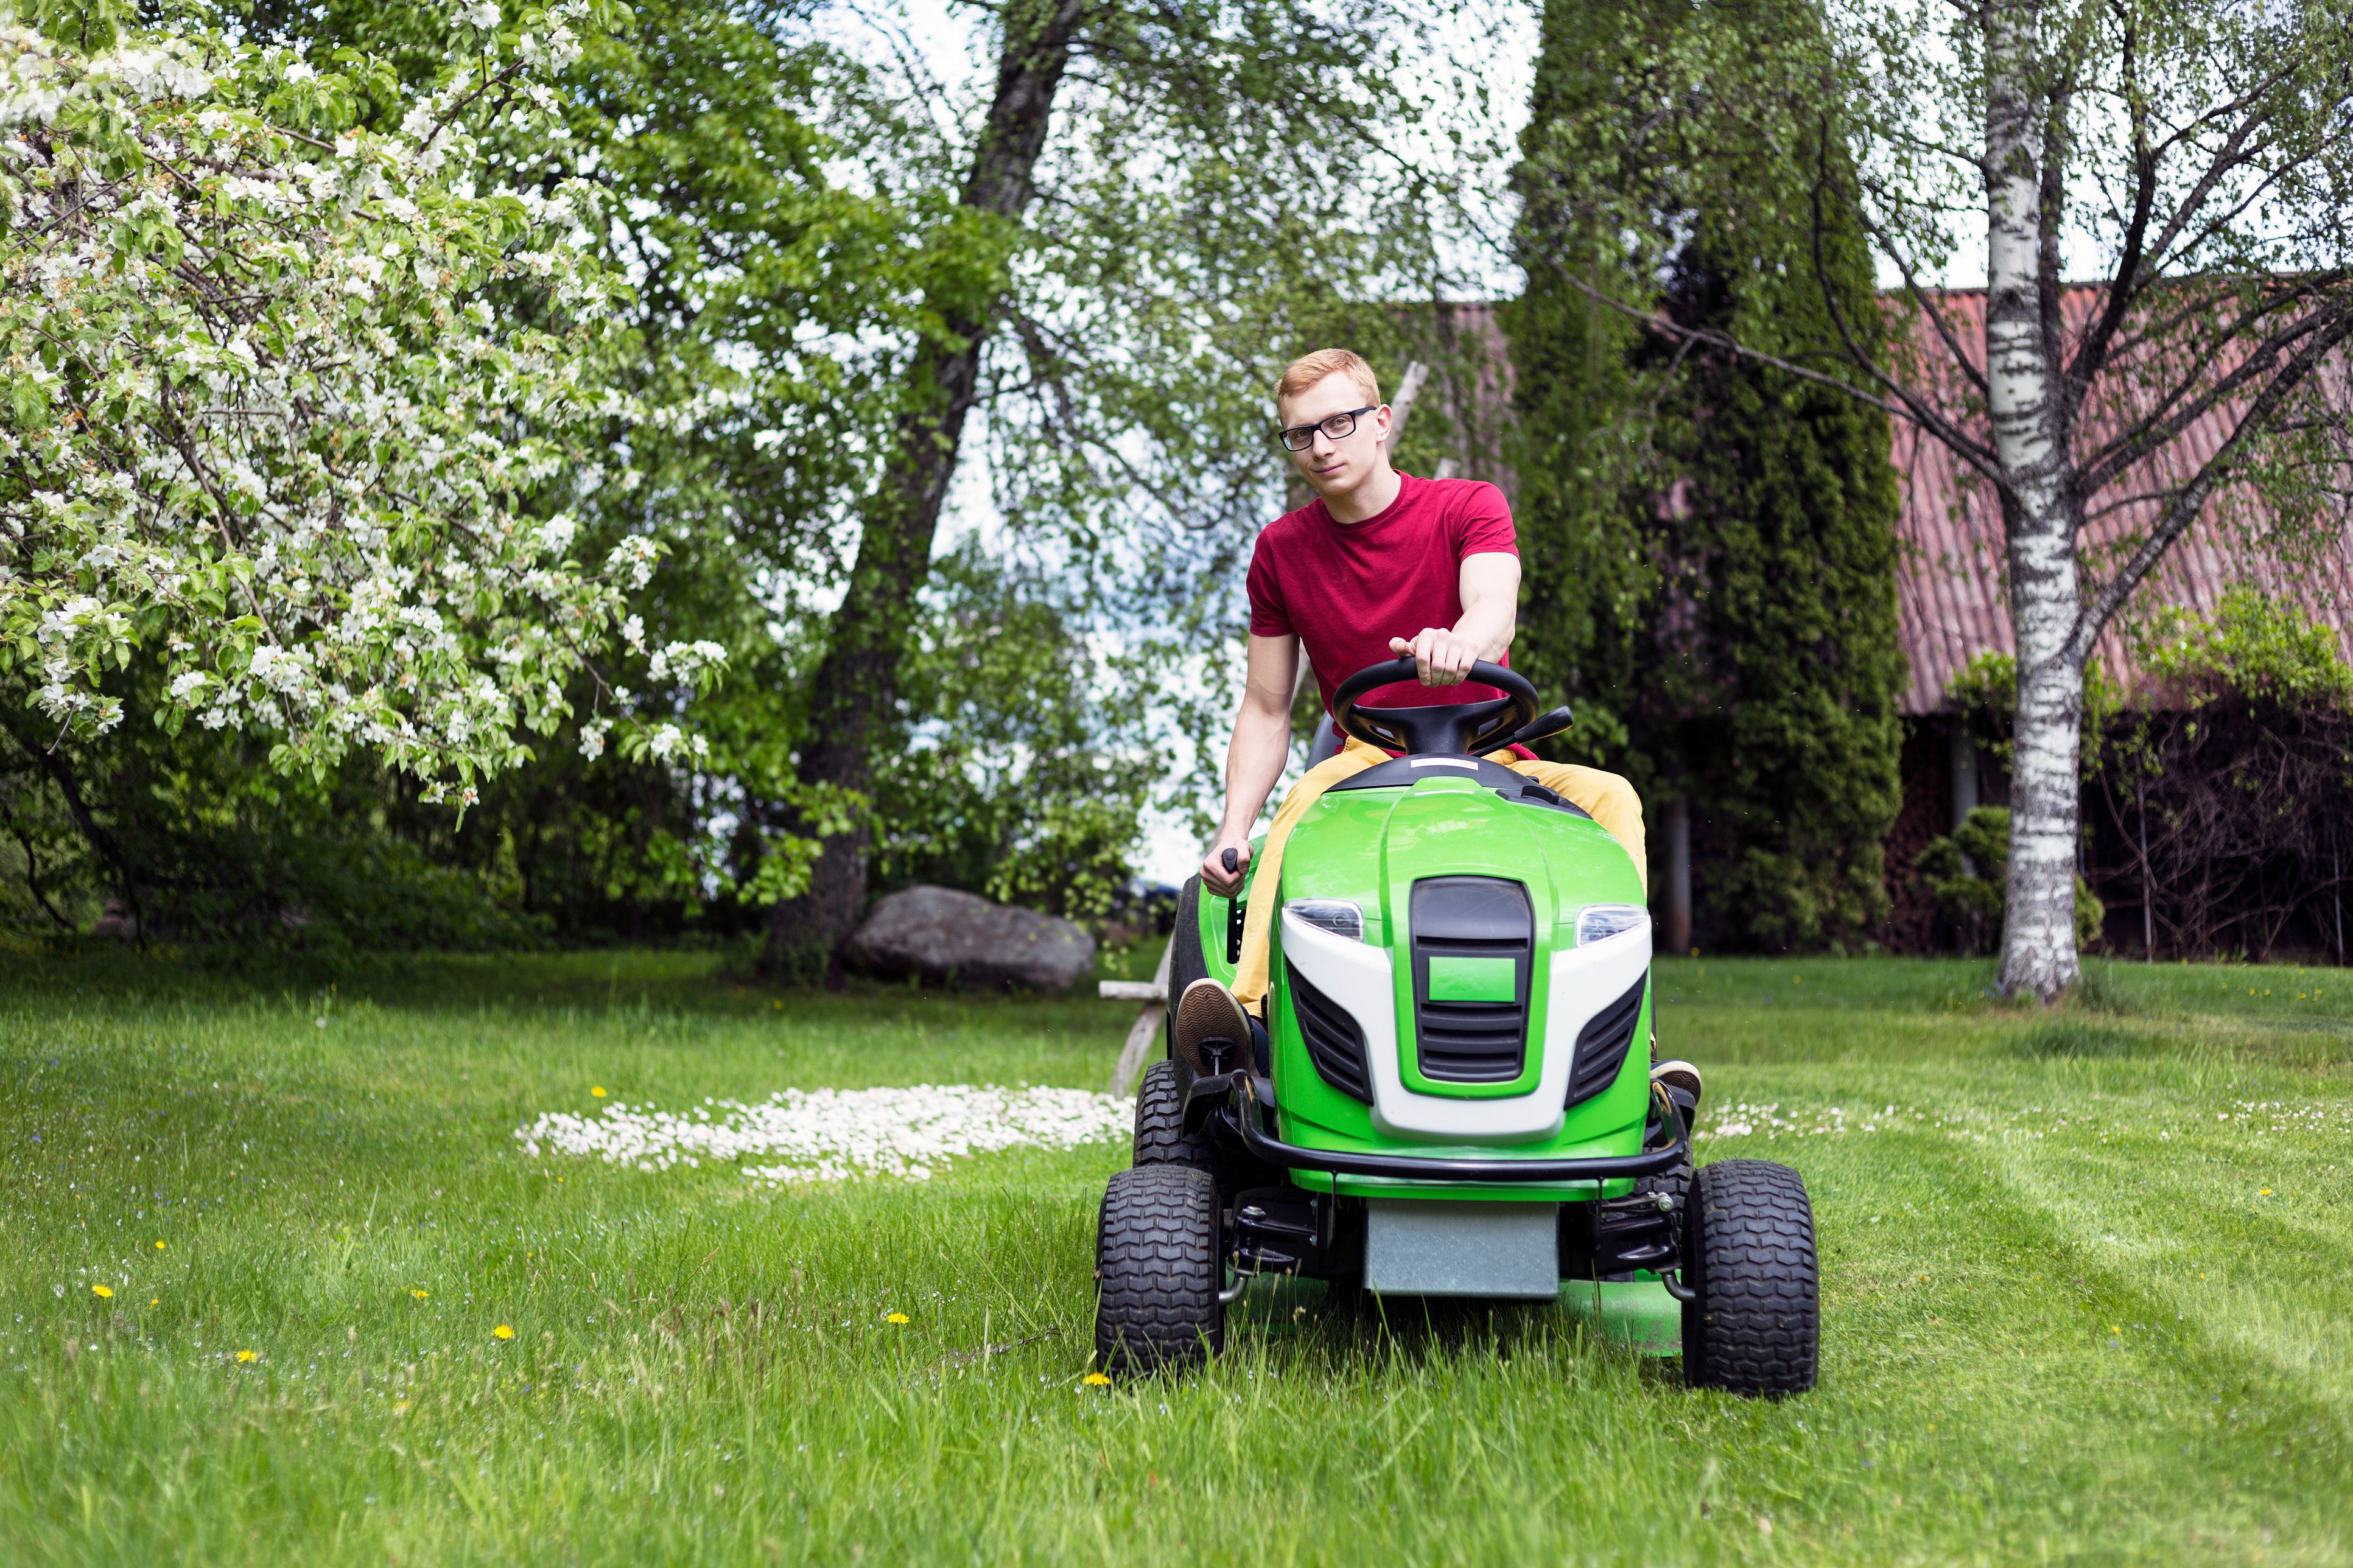 gardener using lawn tractor